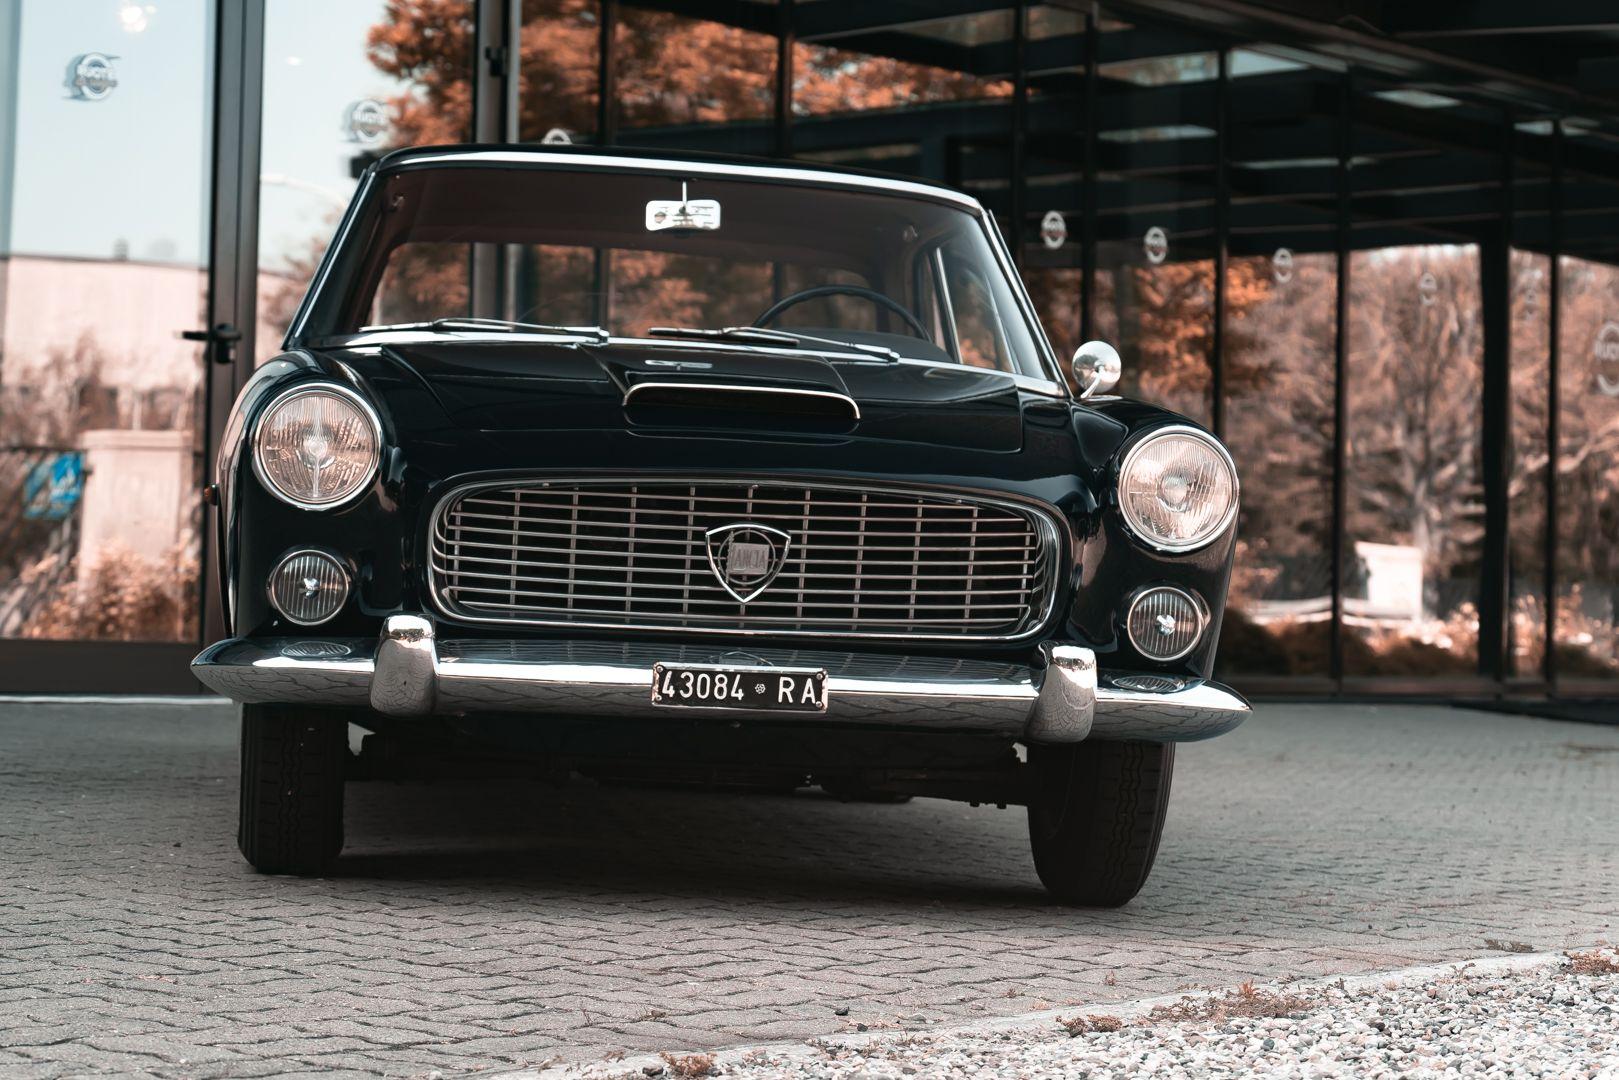 1960 Lancia Flaminia Coupé Pininfarina 2.5 76025